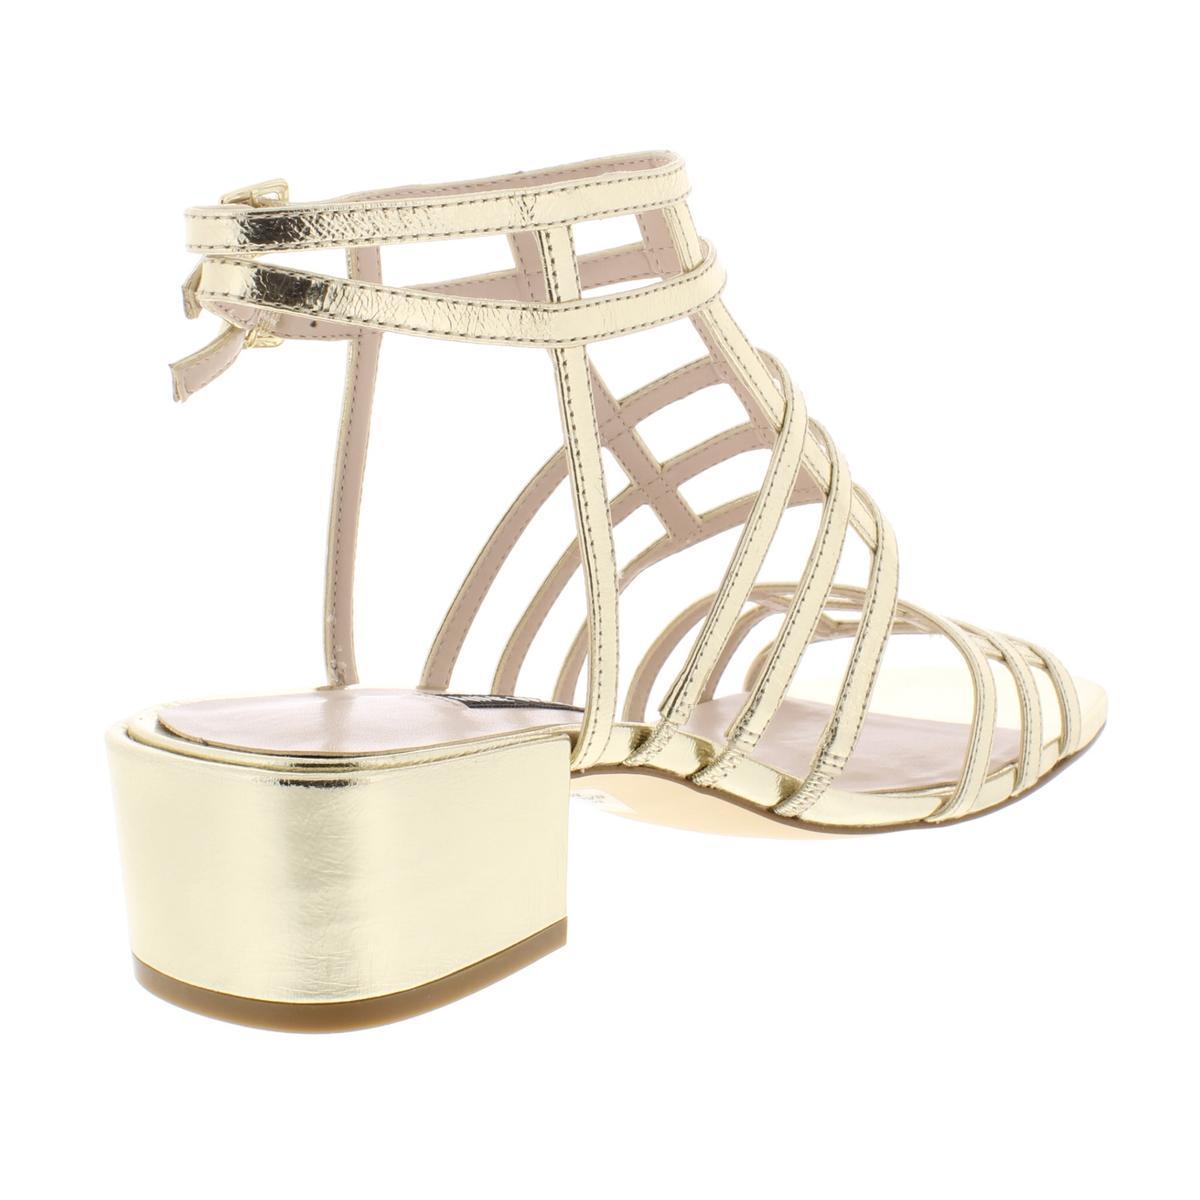 Nine-West-Womens-Xerxes-Leather-Block-Heel-Gladiator-Sandals-Shoes-BHFO-5968 thumbnail 8